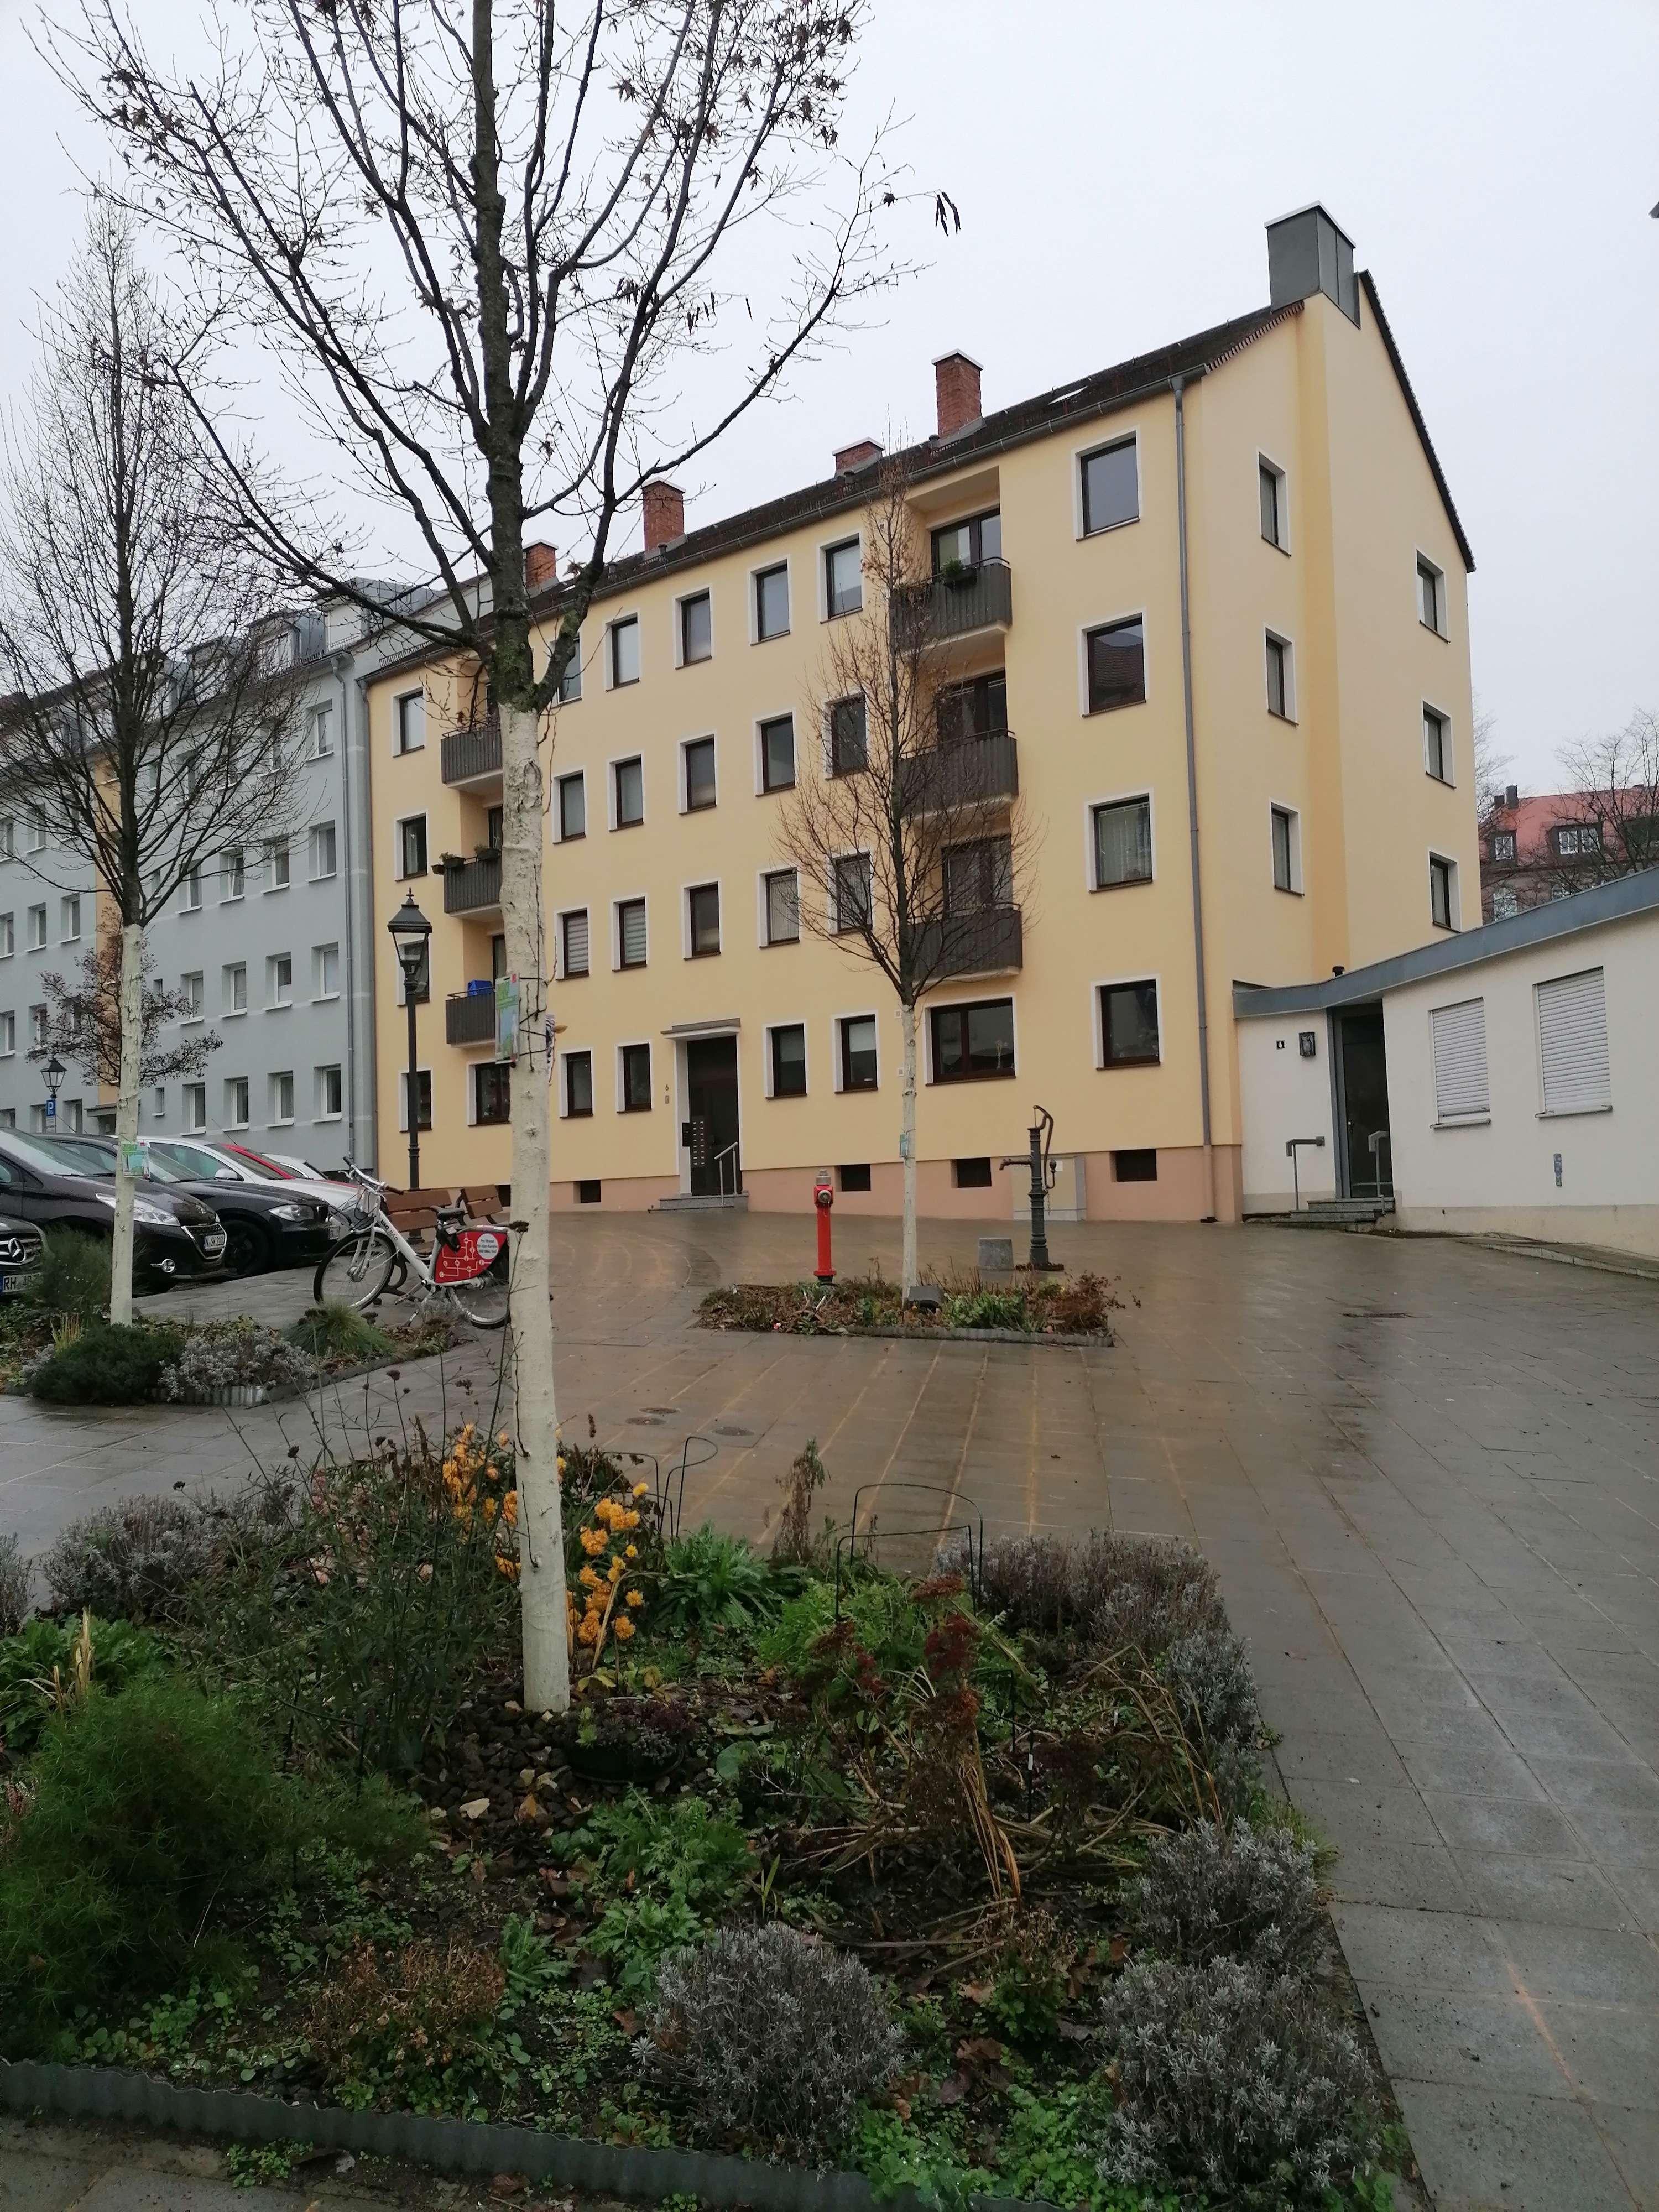 Schöne 4-Zimmerwohnung in Nürnberg-Innenstadt ! Anfragen bitte, nur per E-Mail ! in Altstadt, St. Sebald (Nürnberg)